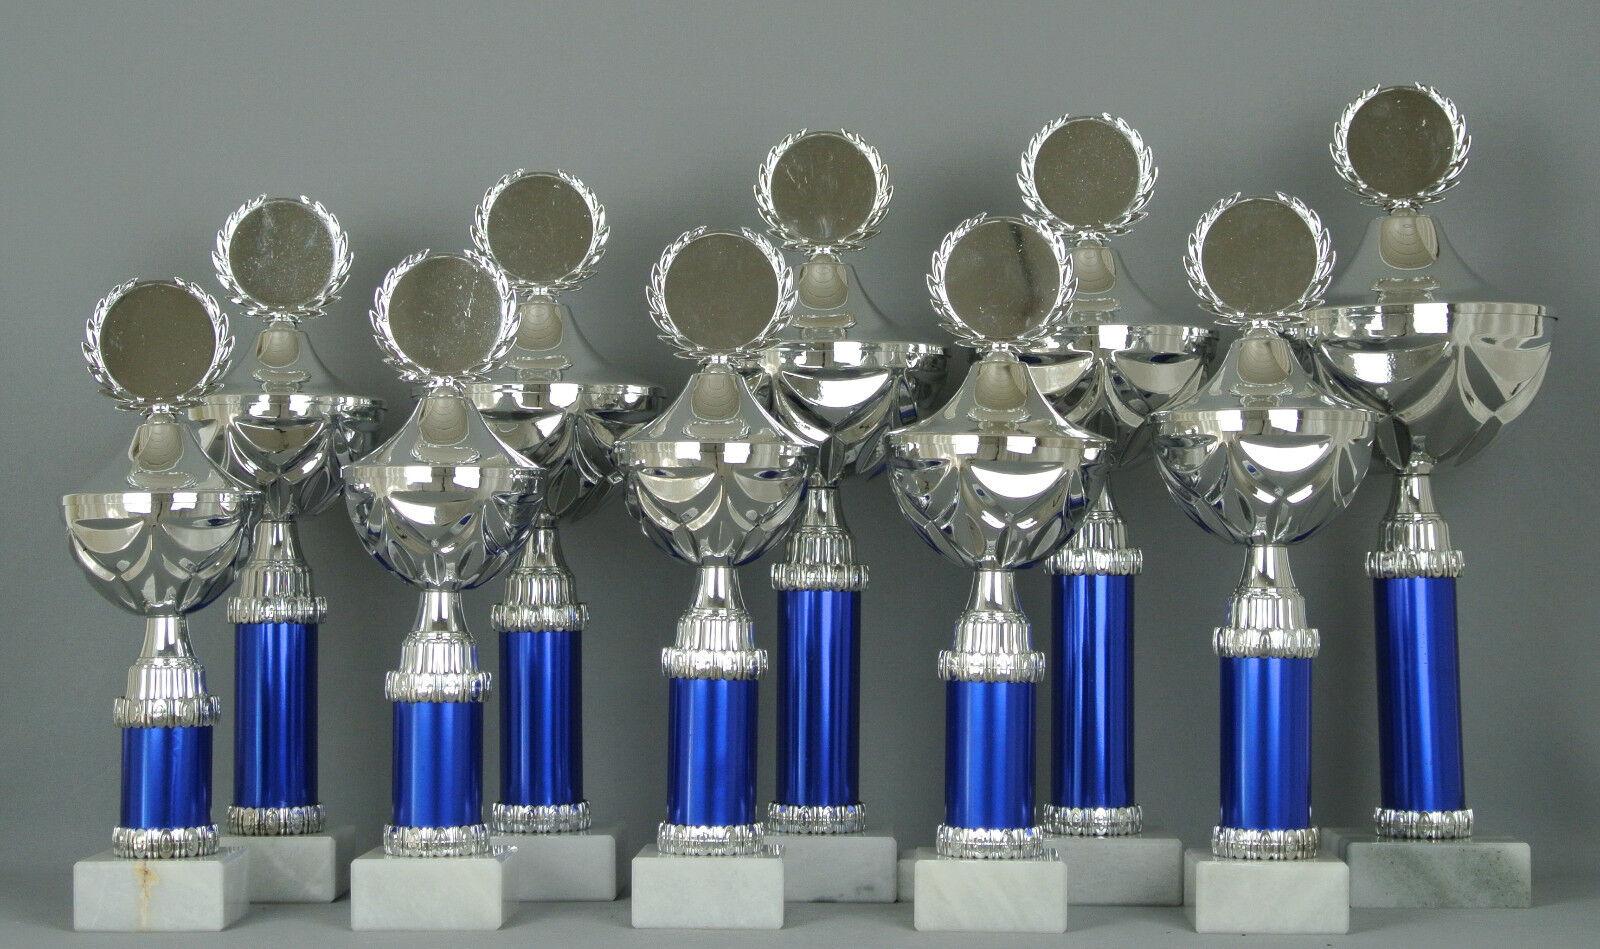 10er Serie Pokale   29-39cm(Ø    90-140mm)   mit Gravur+Emblem   kompl. montiert 97010c